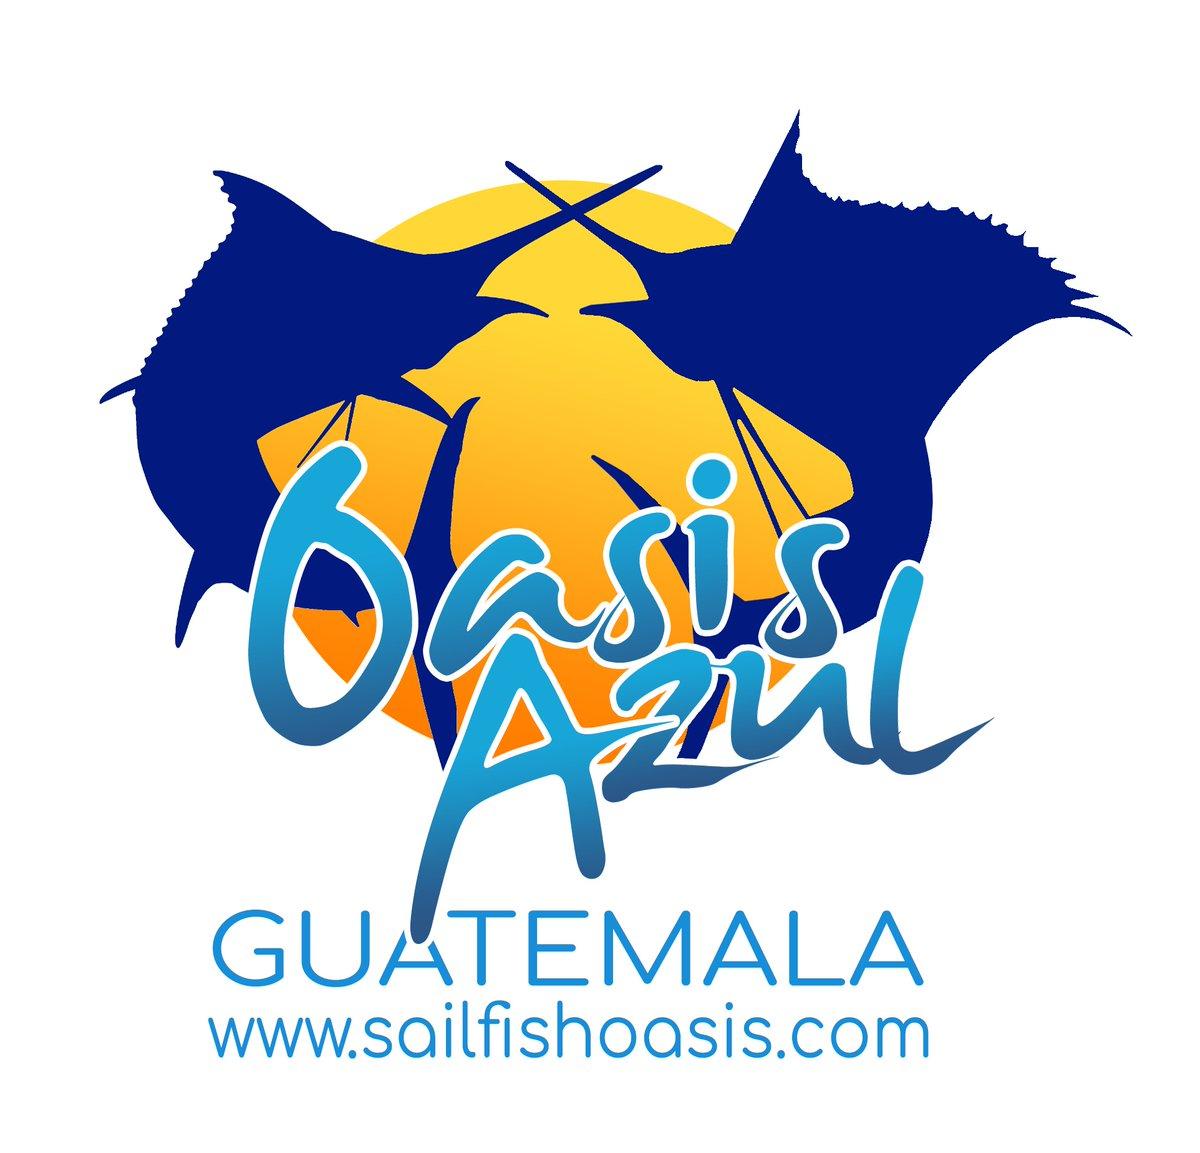 Sailfish Oasis Guatemala  https://t.co/yYd6whSWUQ